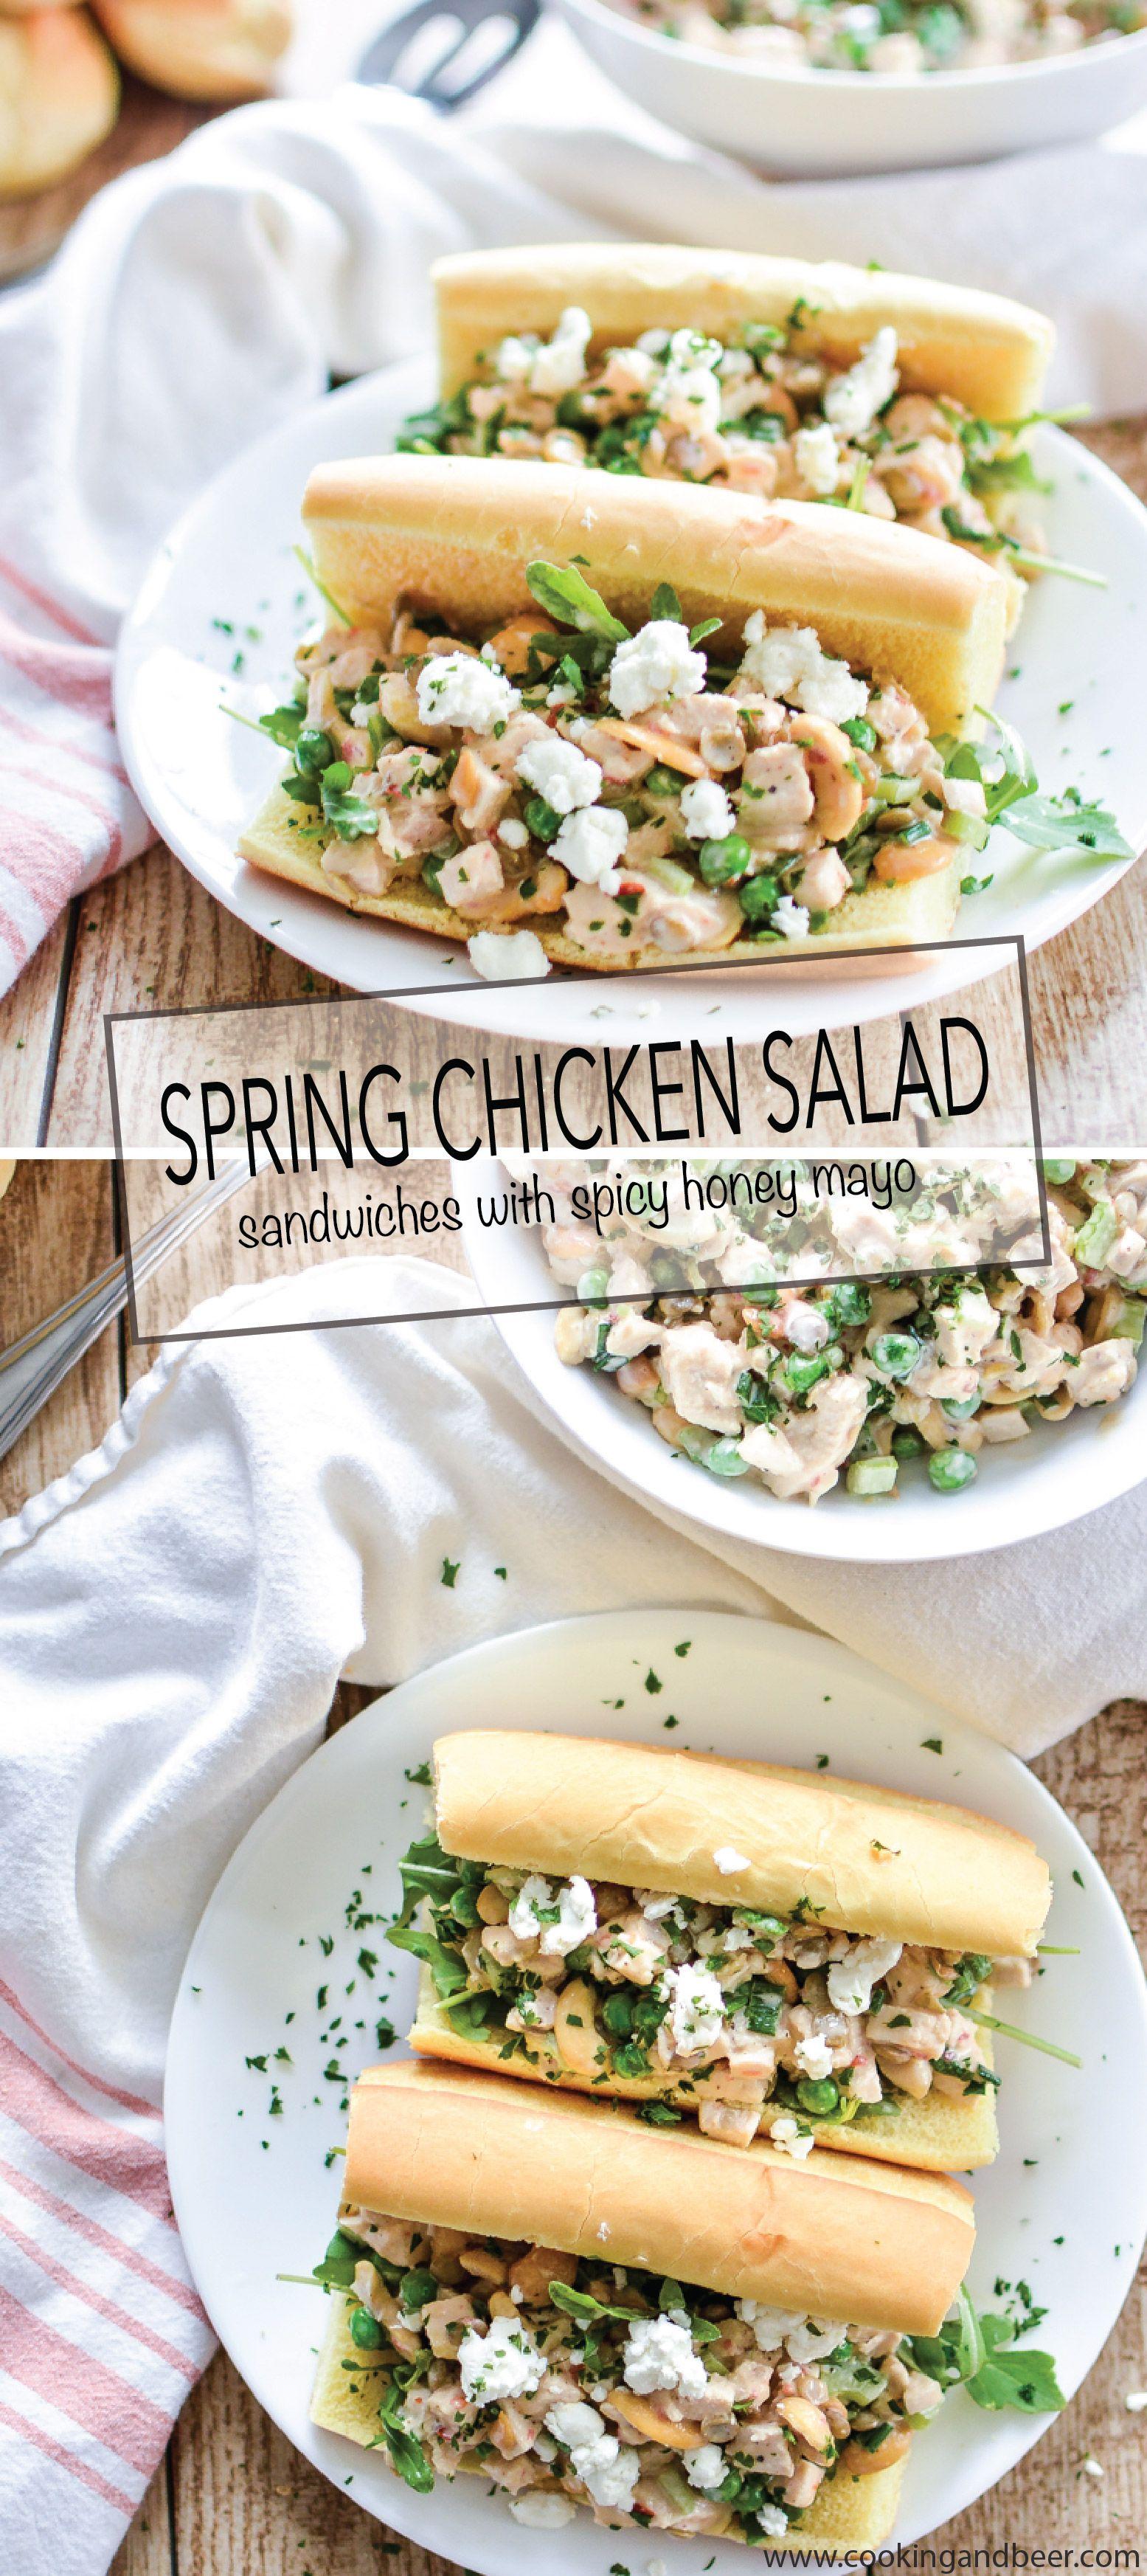 Spring Chicken Salad Sandwiches With Lentils And Spicy Honey Mayo Recipe Chicken Salad Recipe Easy Chicken Salad Sandwich Traditional Chicken Salad Sandwich